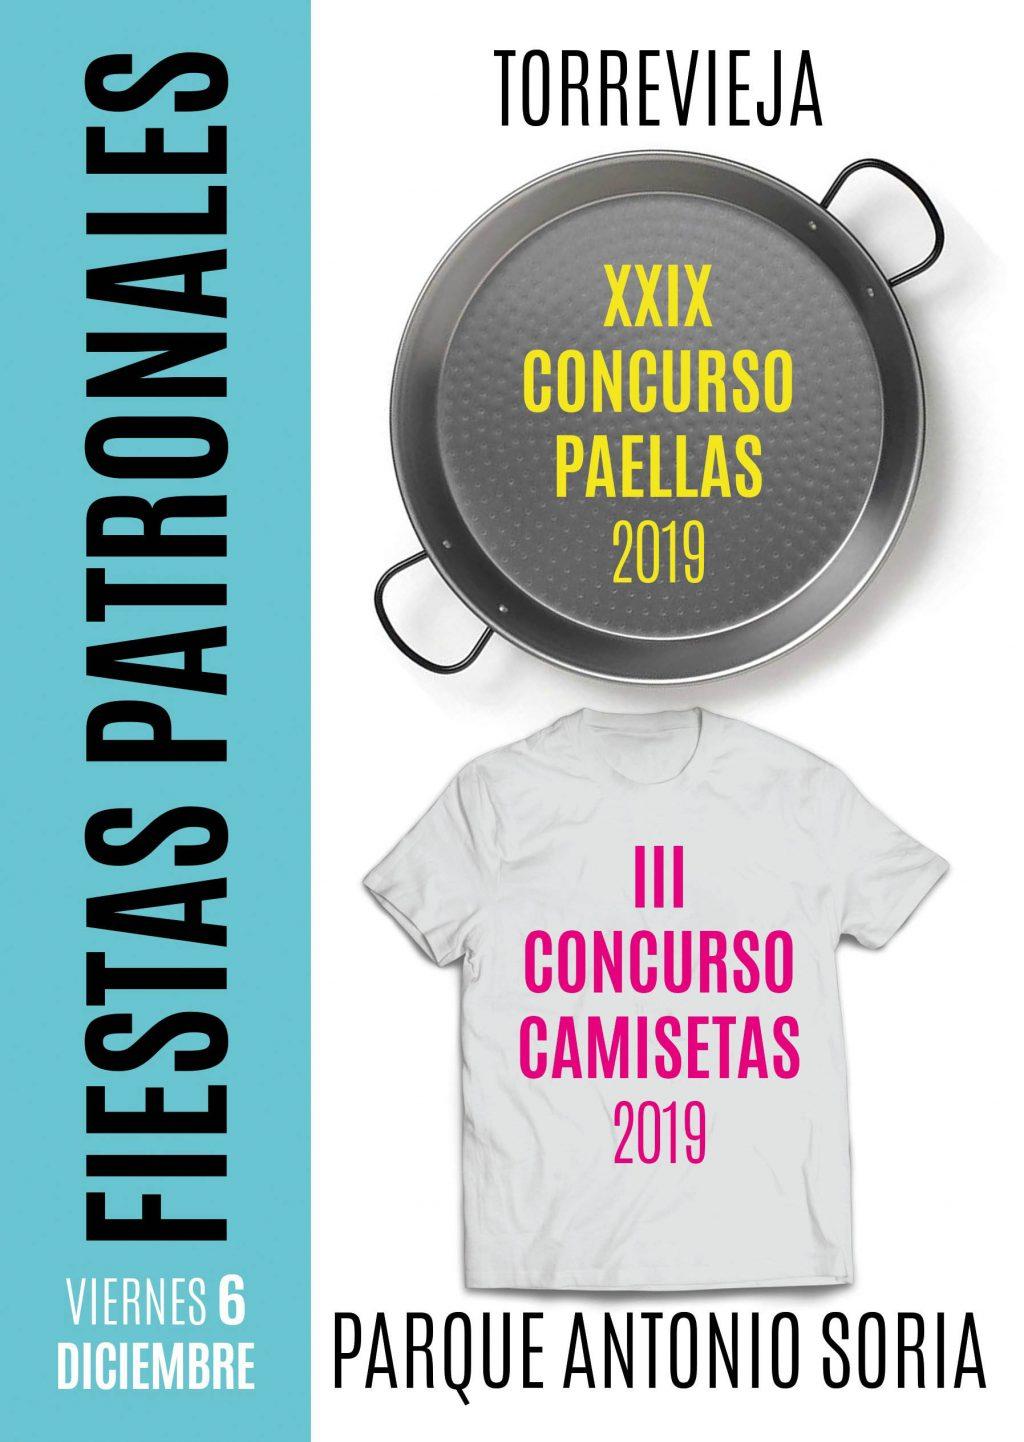 Concurso paellas Torrevieja 2019